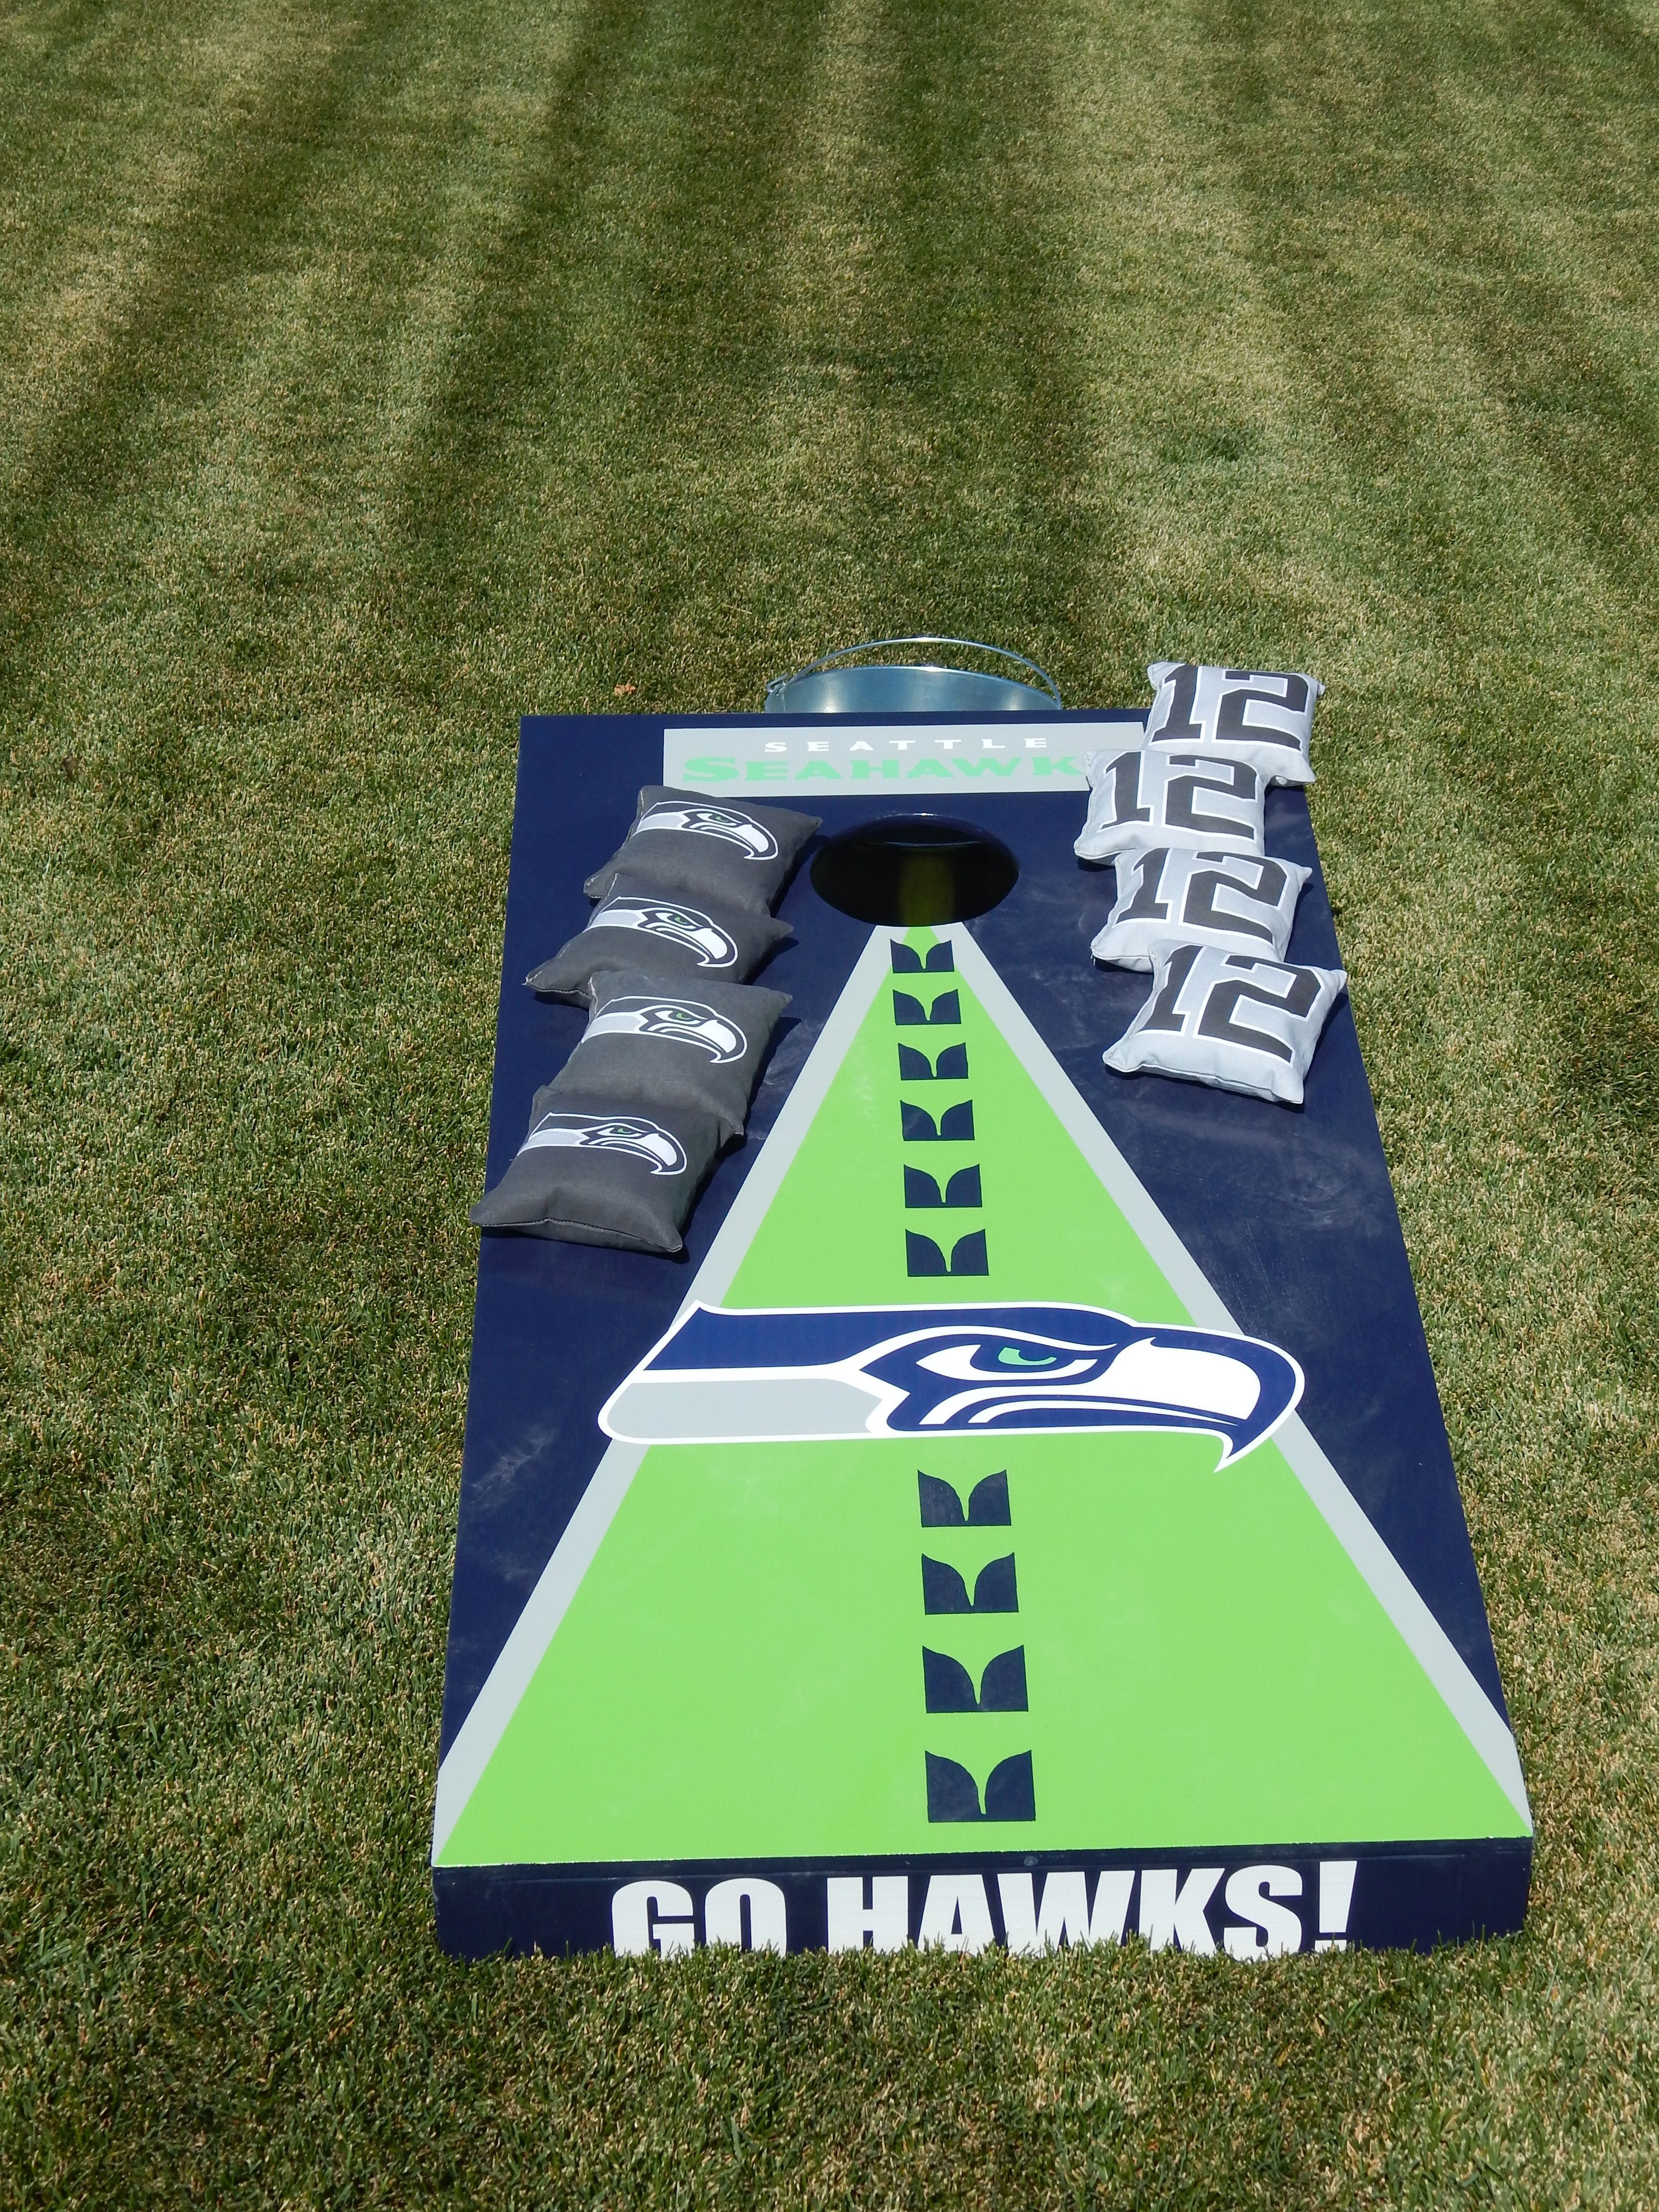 Cornhole Outdoor Games Cornhole Outdoorgames 12thman Seahawks Gohawks With Images Cornhole Designs Seahawks Crafts Cornhole